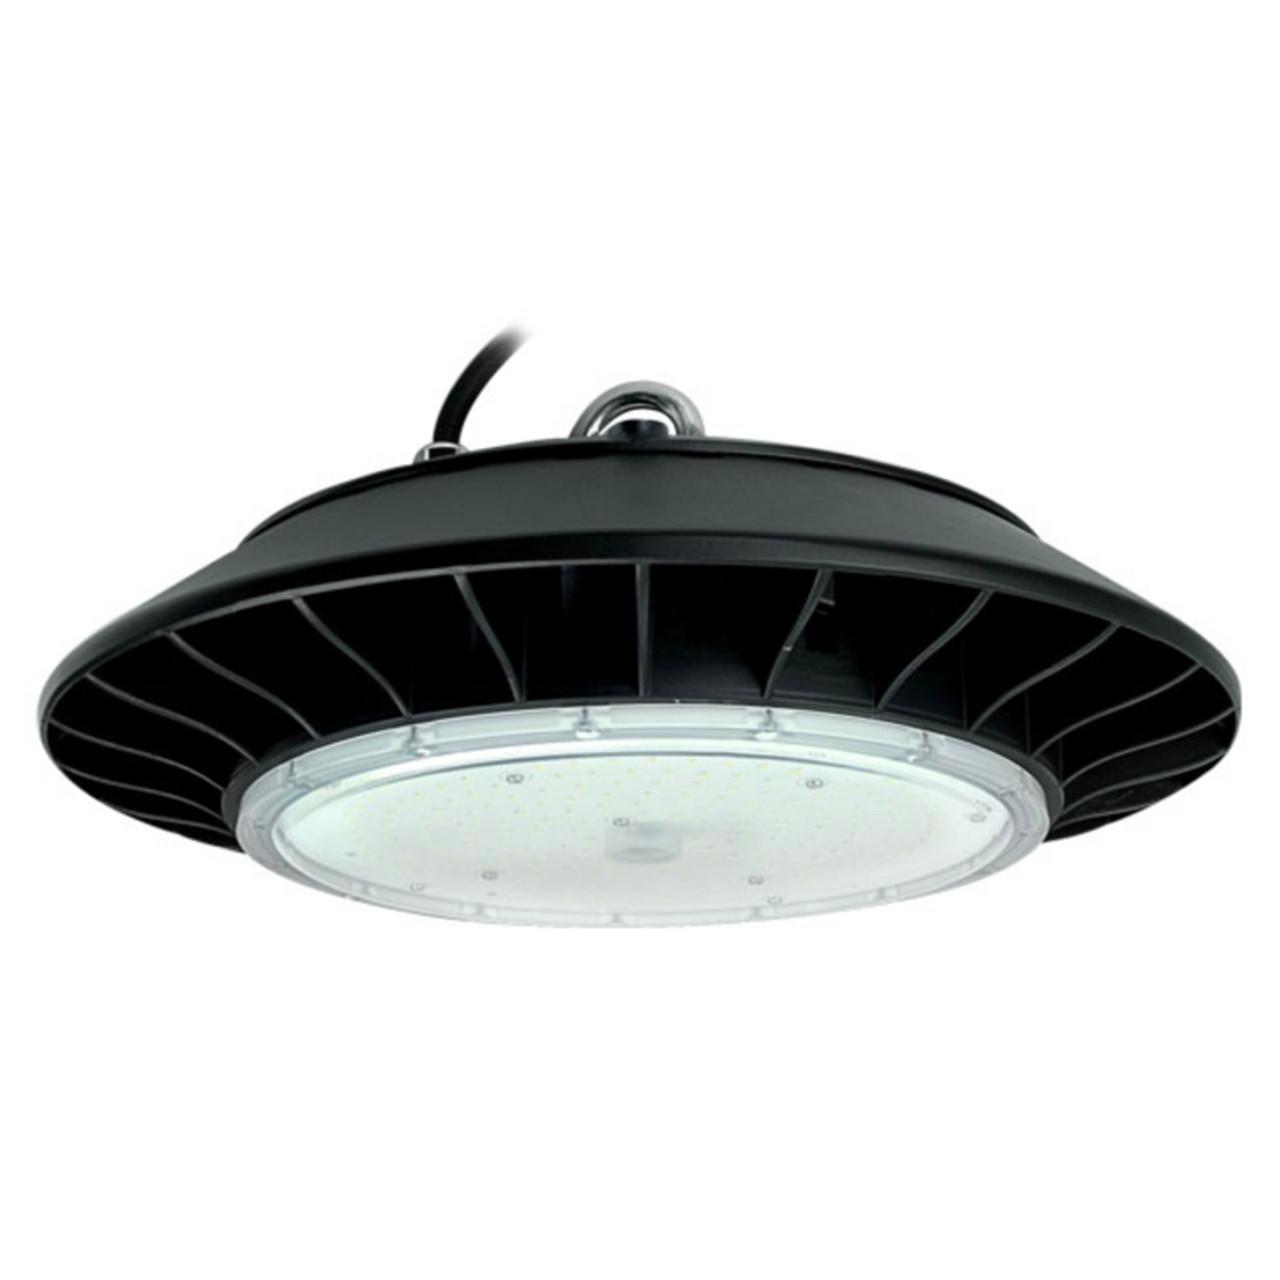 150 watt ufo led commercial high bay lighting fixture replaces 400 watt hid 17 250 lumens 10 year warranty